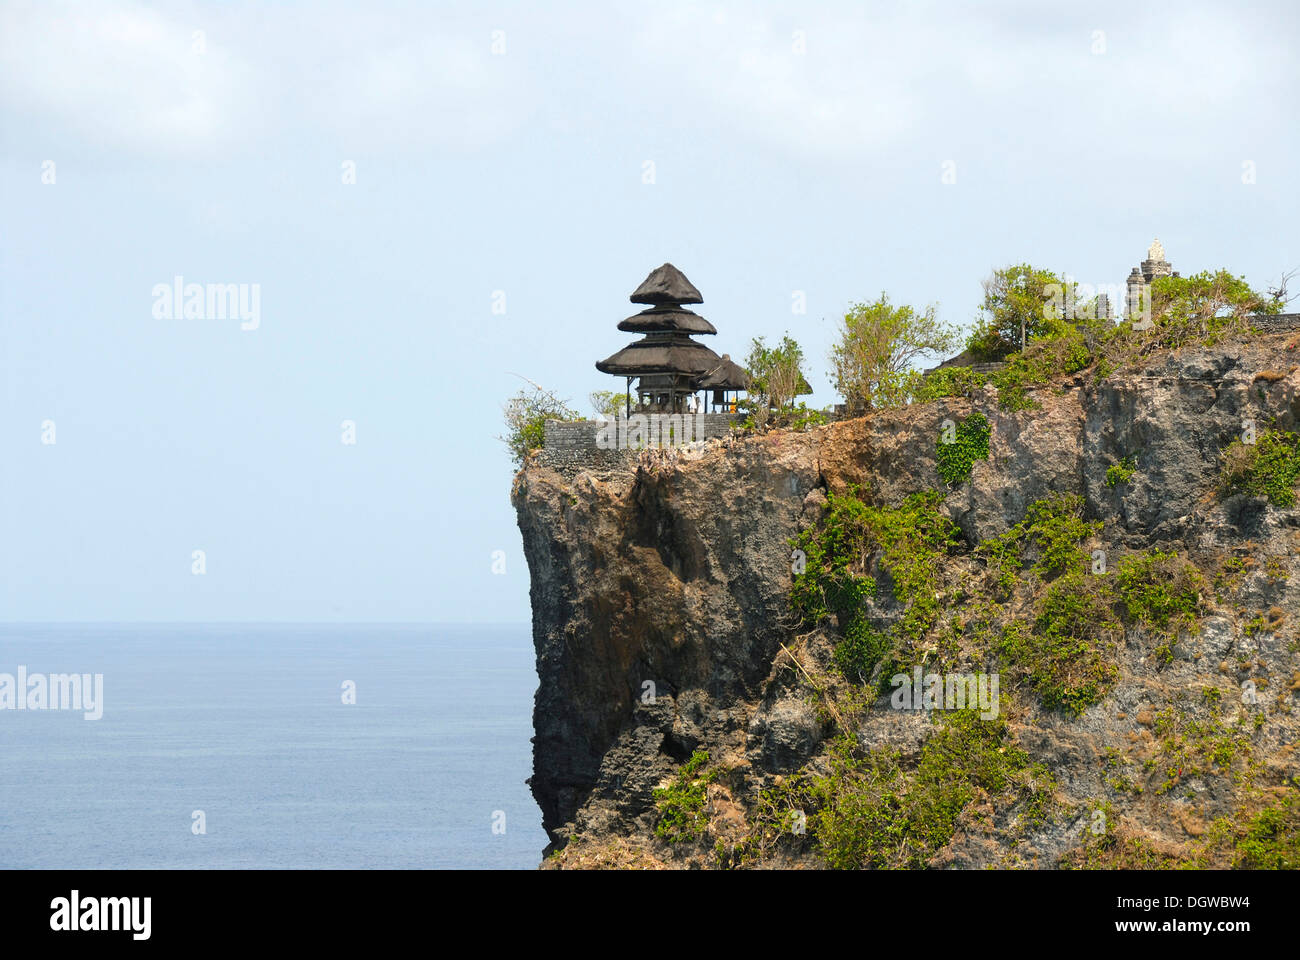 Balinese Hinduism, sanctuary on a cliff high above the sea, Balinese pagoda, Pura Luhur Uluwatu temple, Bukit peninsula, Stock Photo